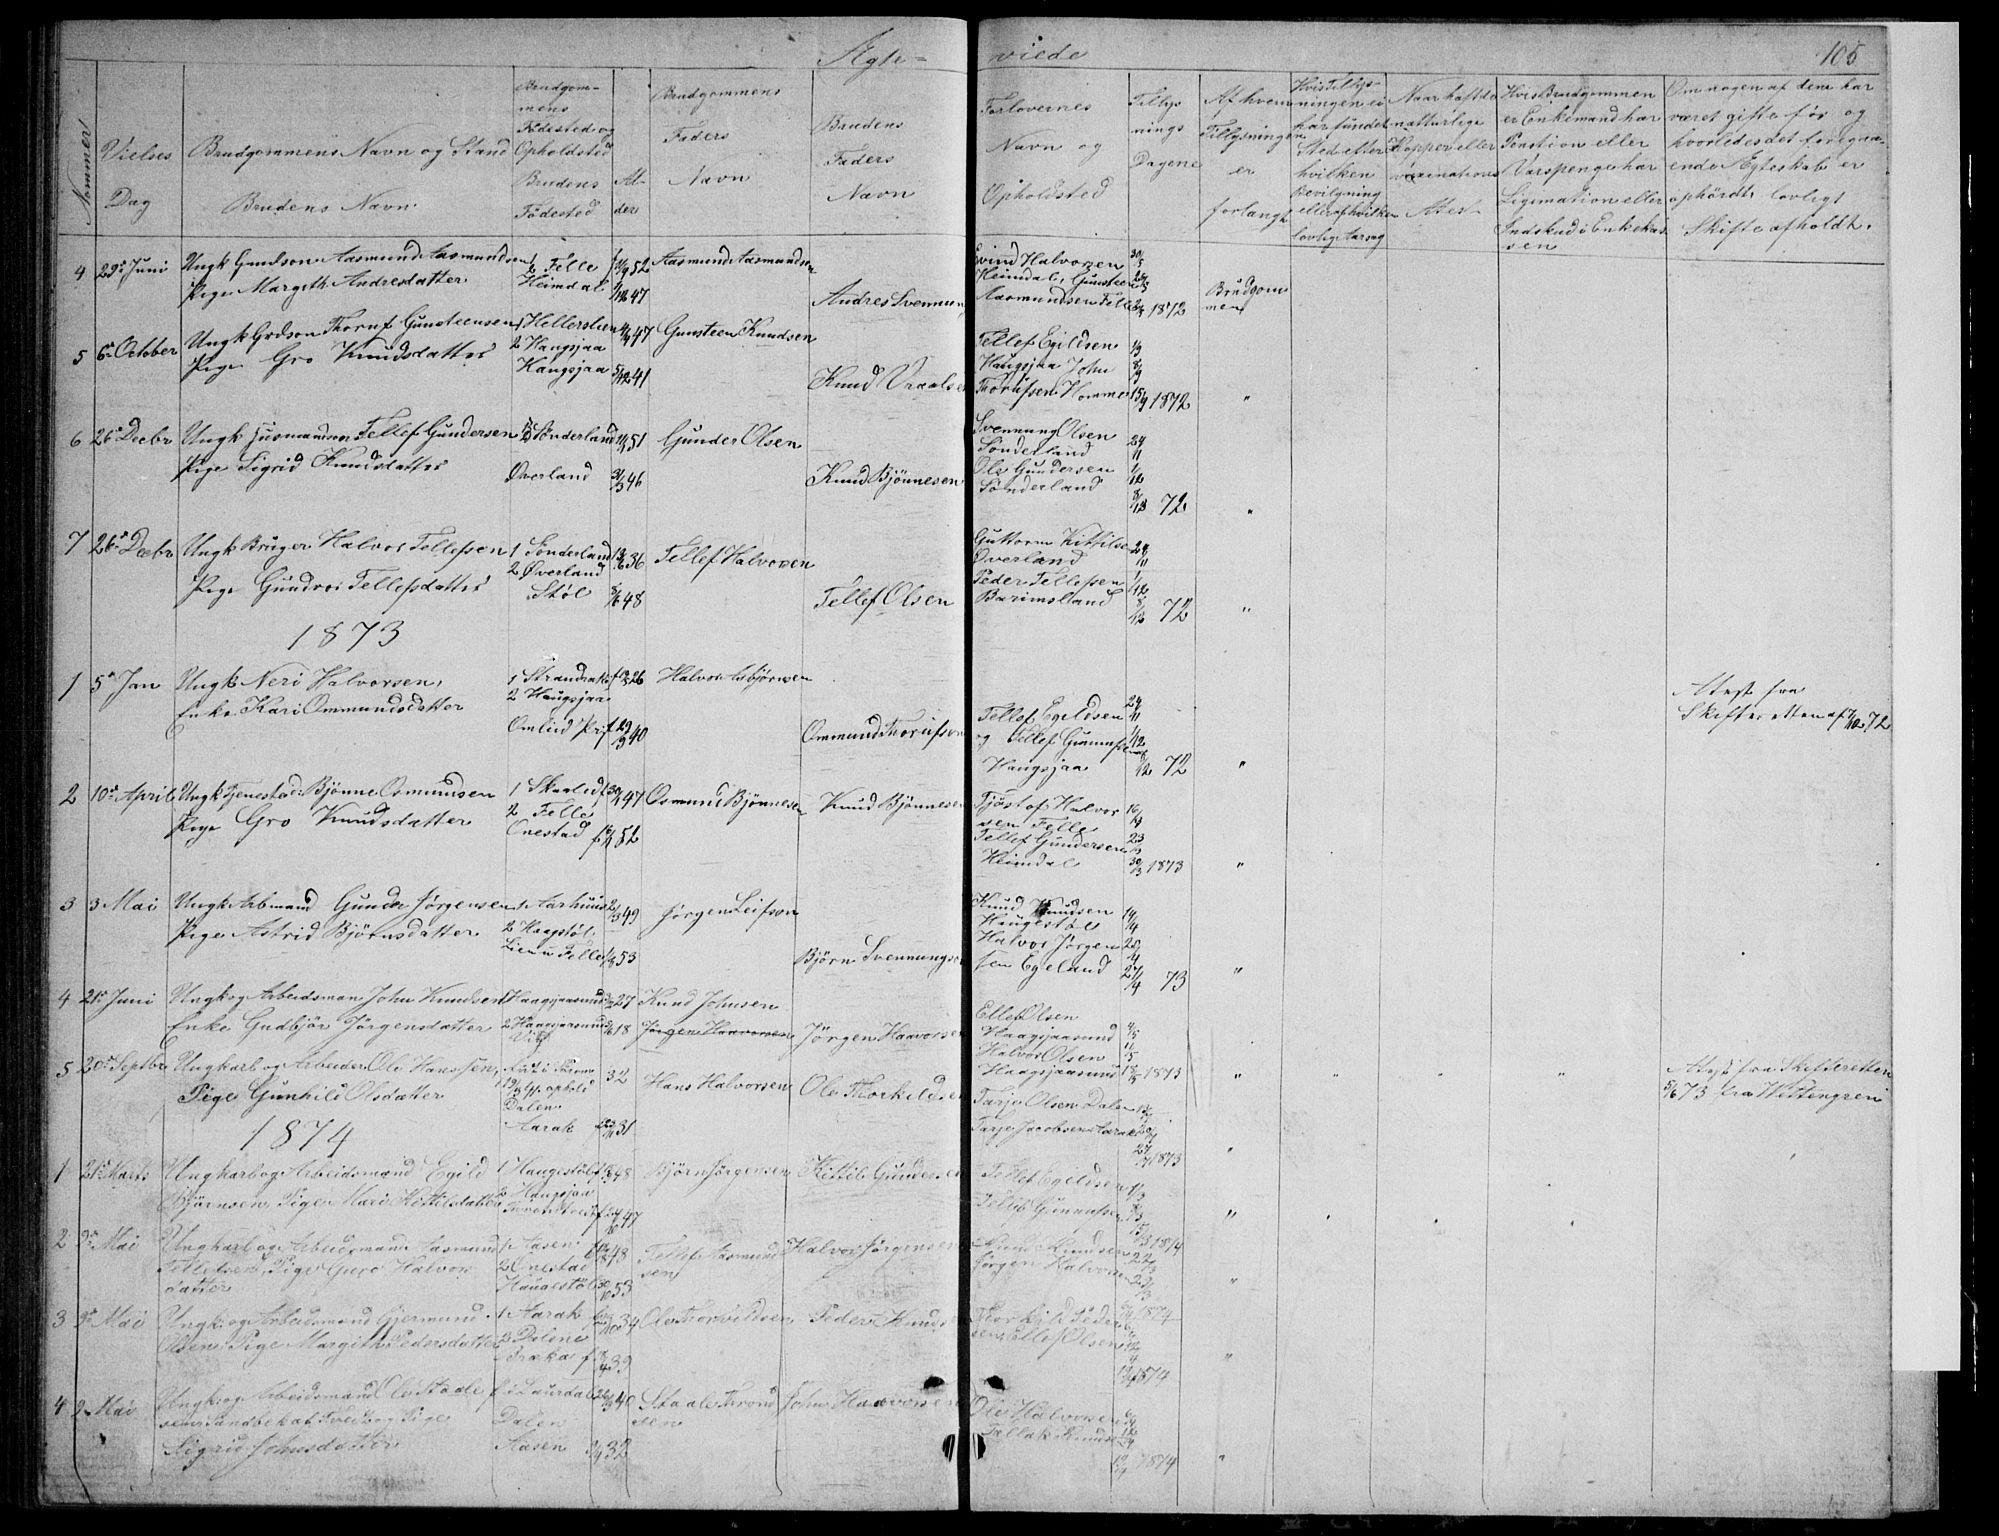 SAKO, Nissedal kirkebøker, G/Gb/L0002: Klokkerbok nr. II 2, 1863-1892, s. 105